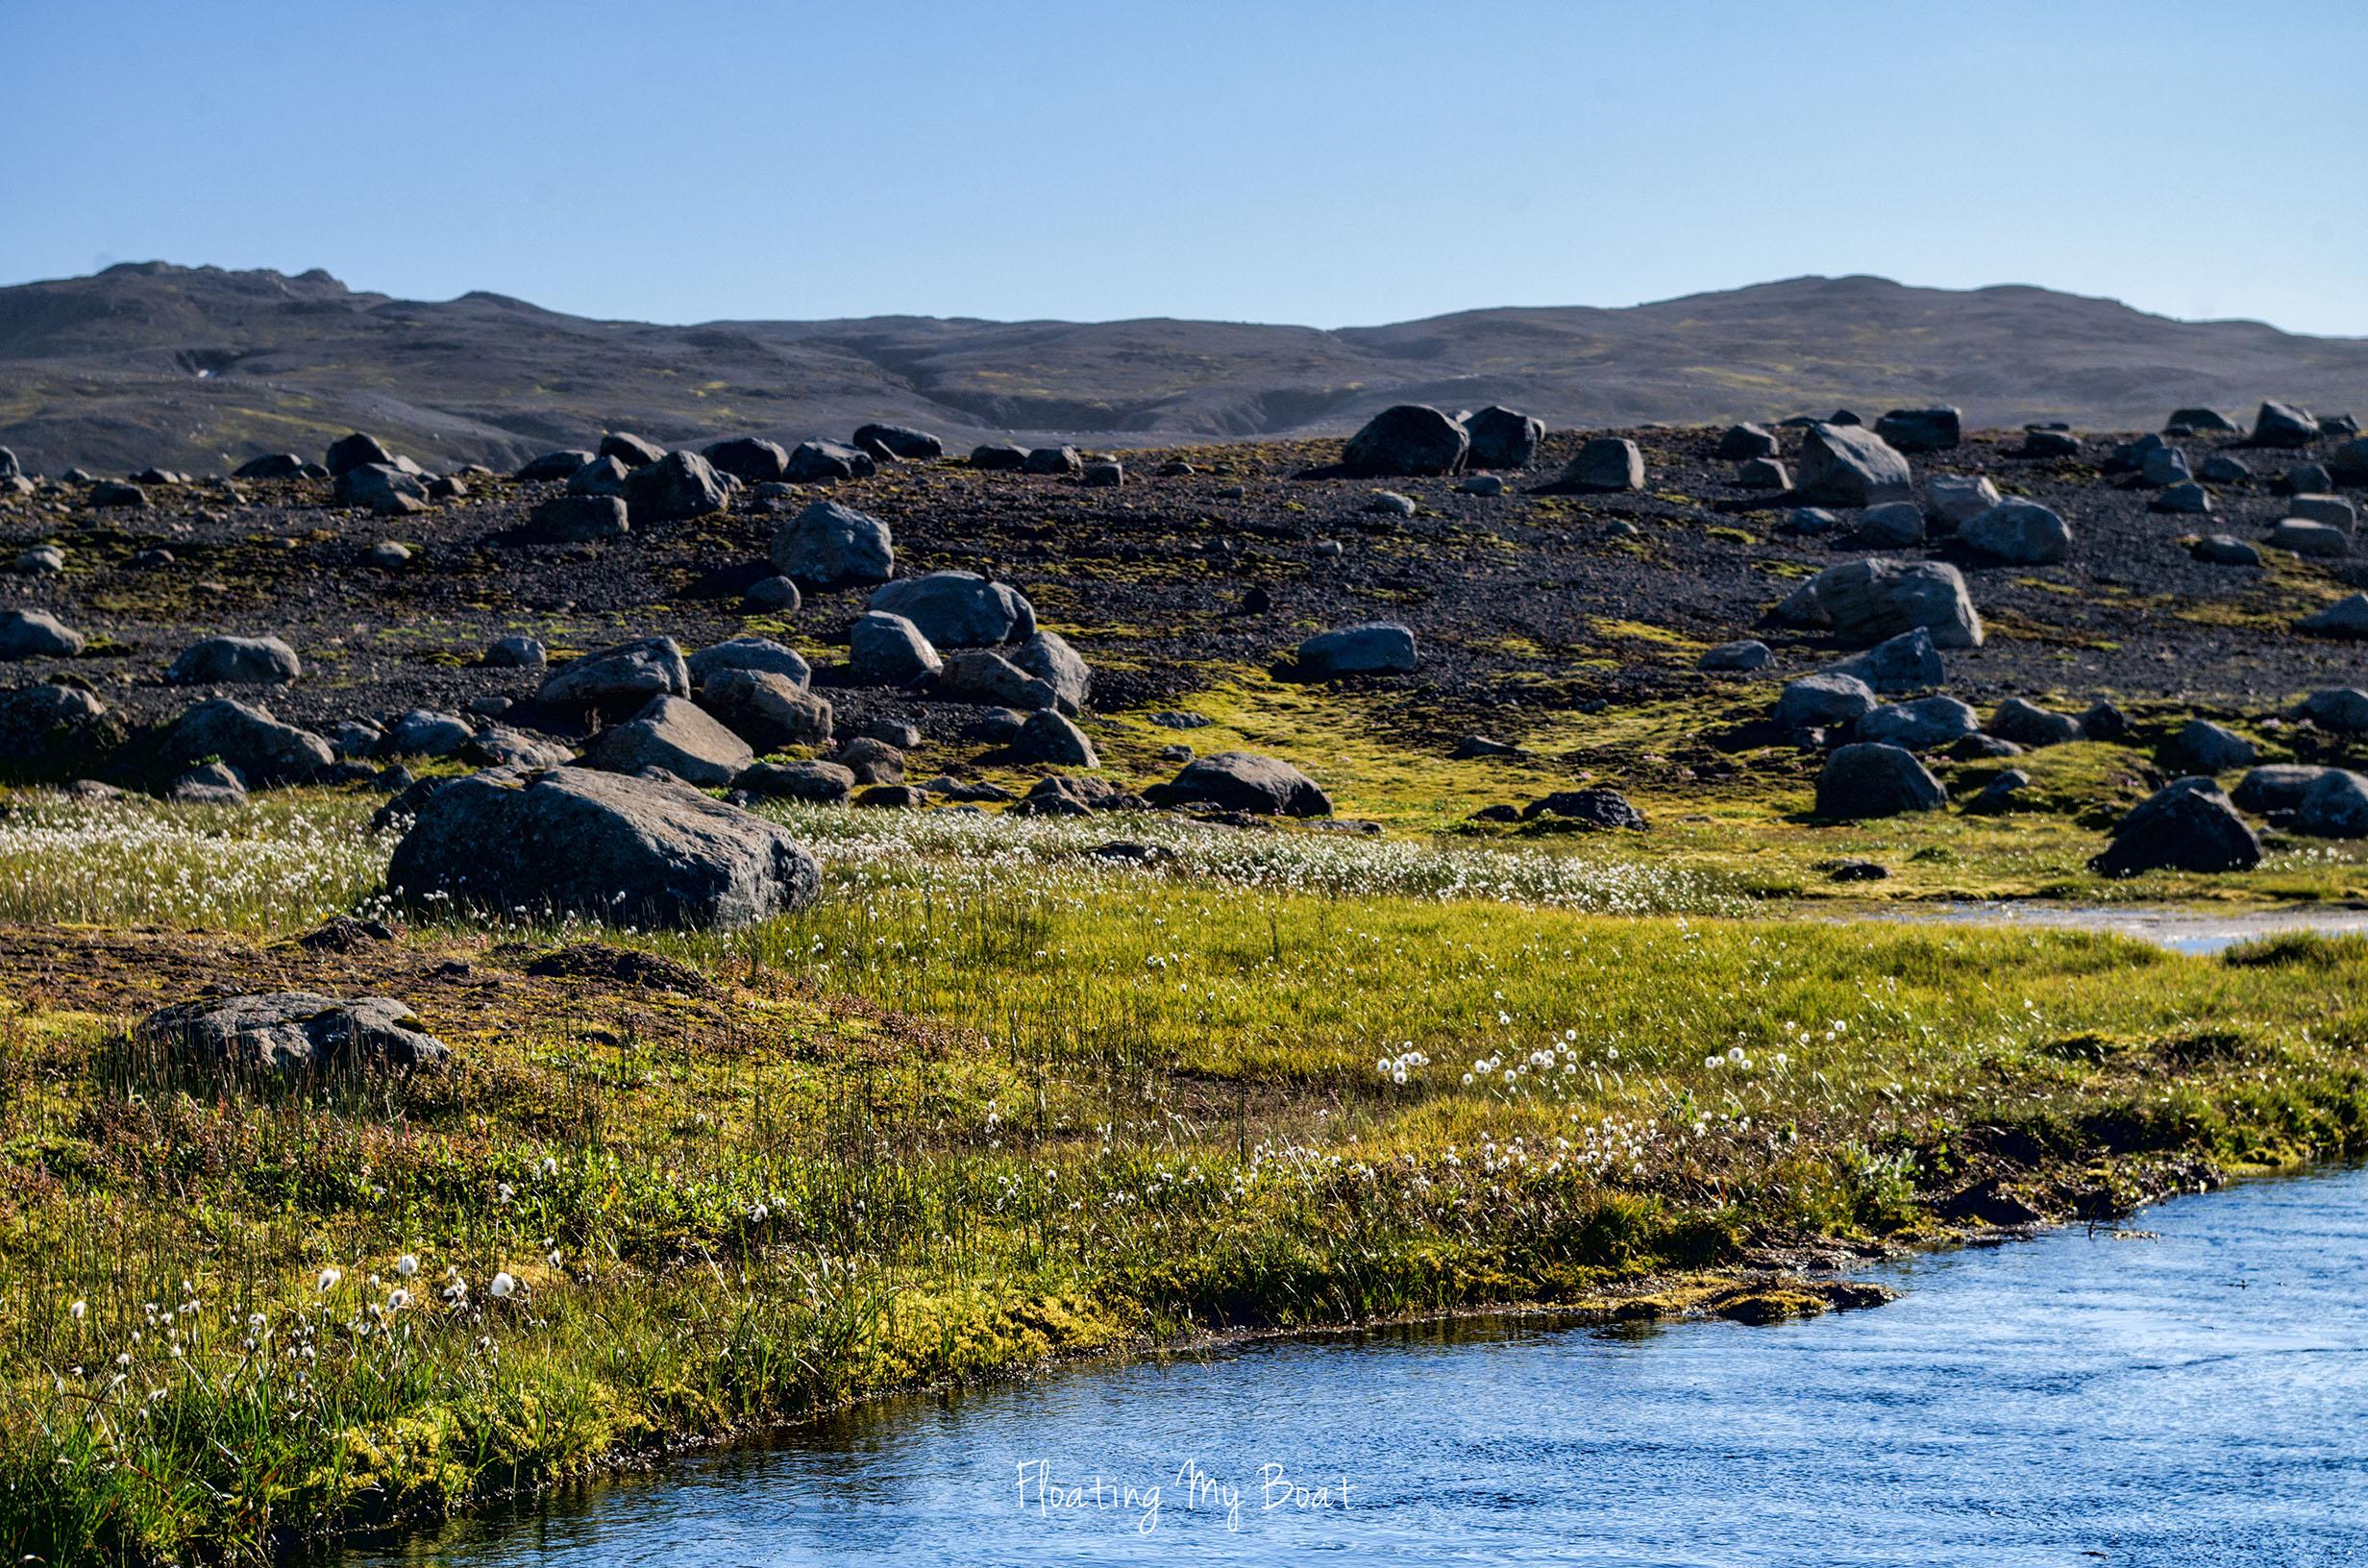 trekking-iceland-vatnajokull-national-park-56